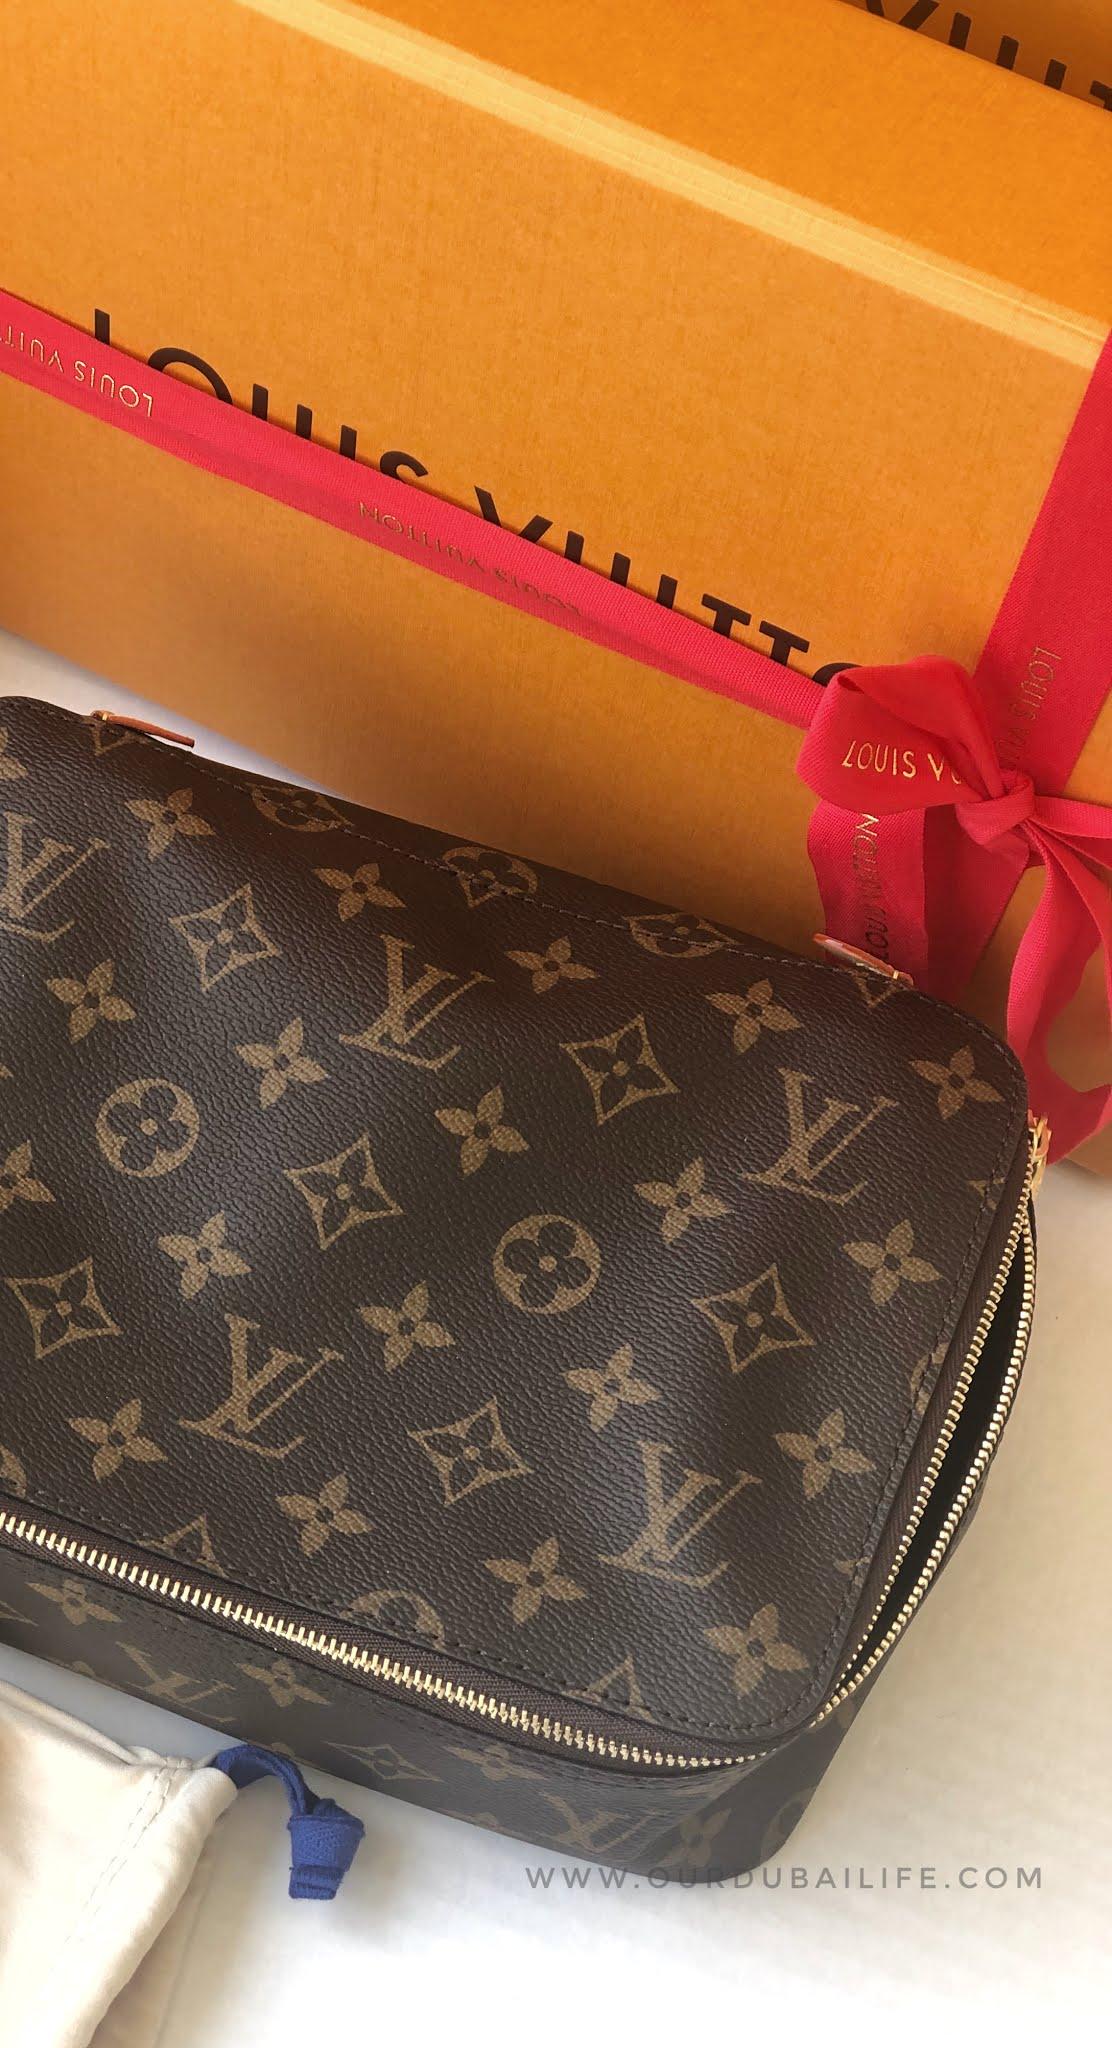 Louis Vuitton Packing Cube